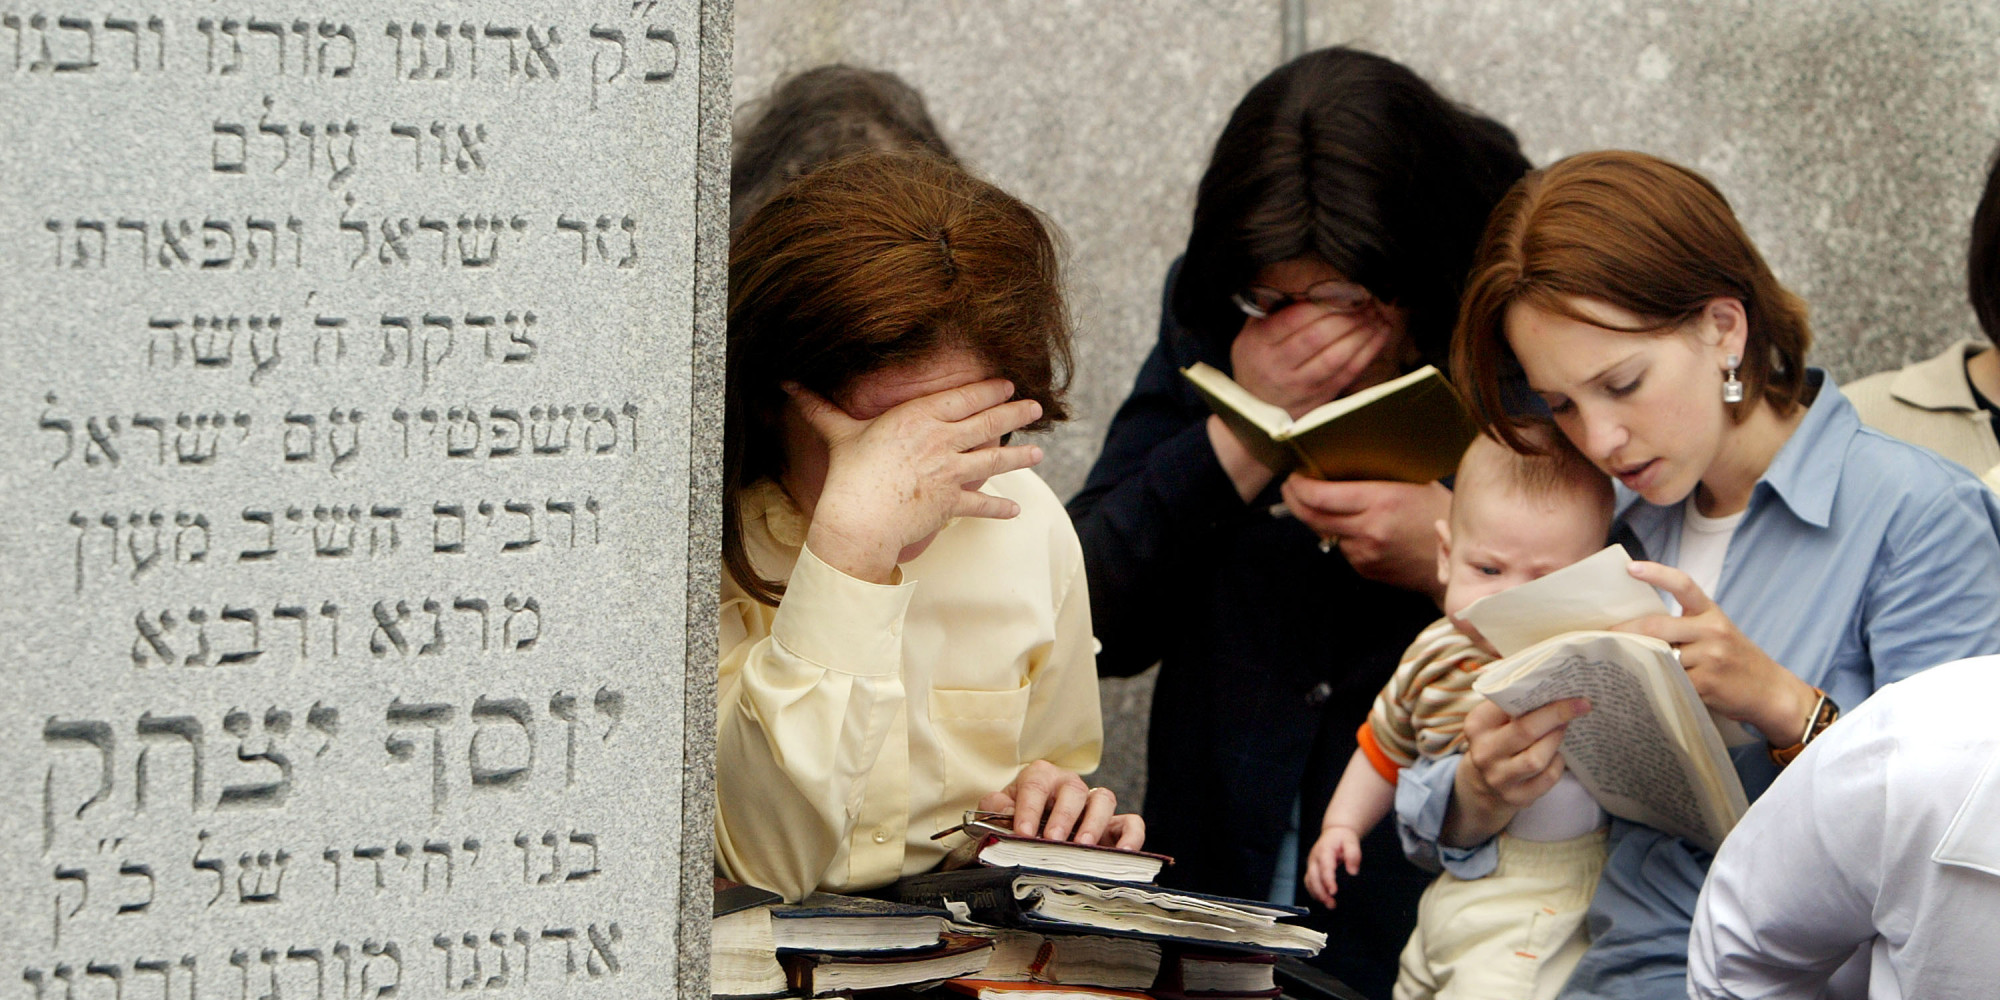 Jewish dating sites over 50 toronto ontario